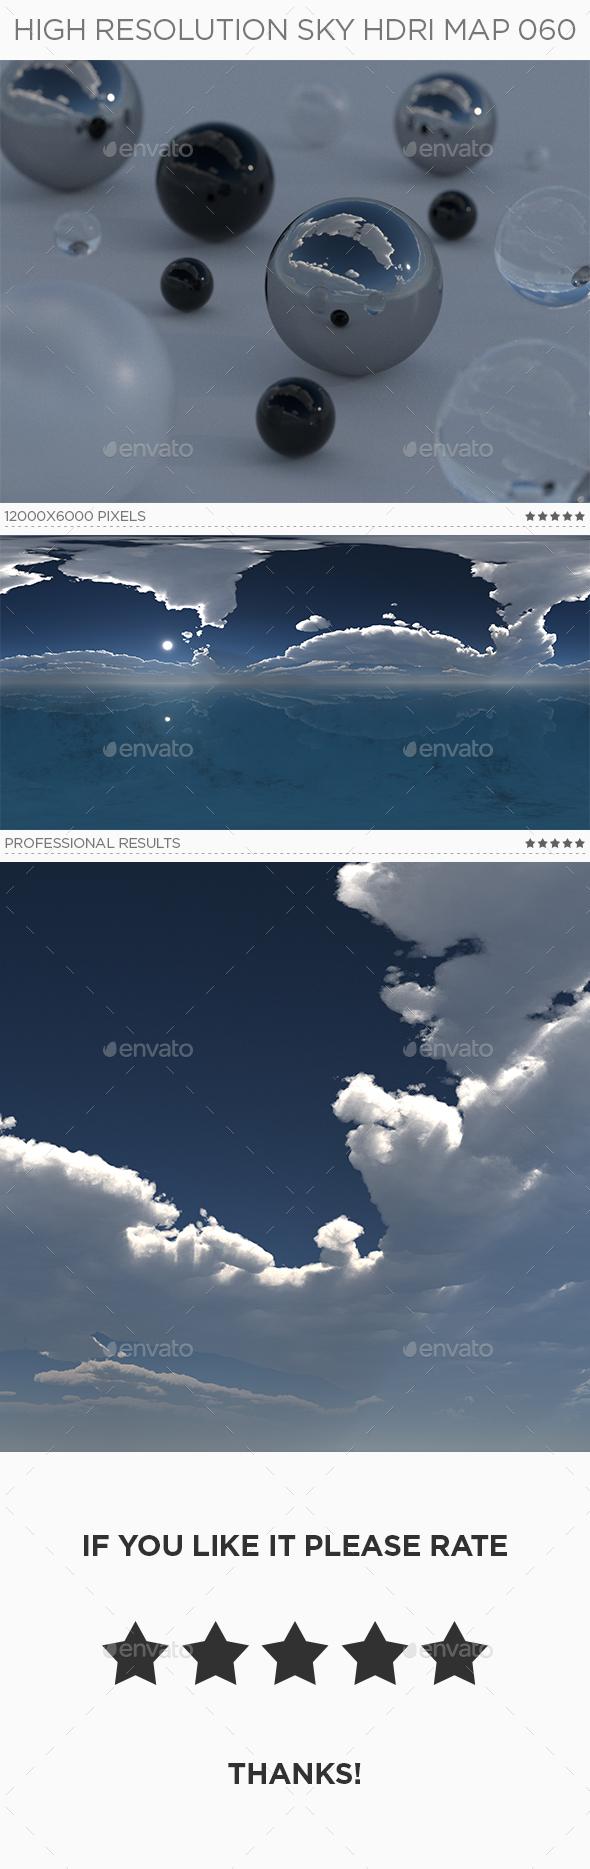 High Resolution Sky HDRi Map 060